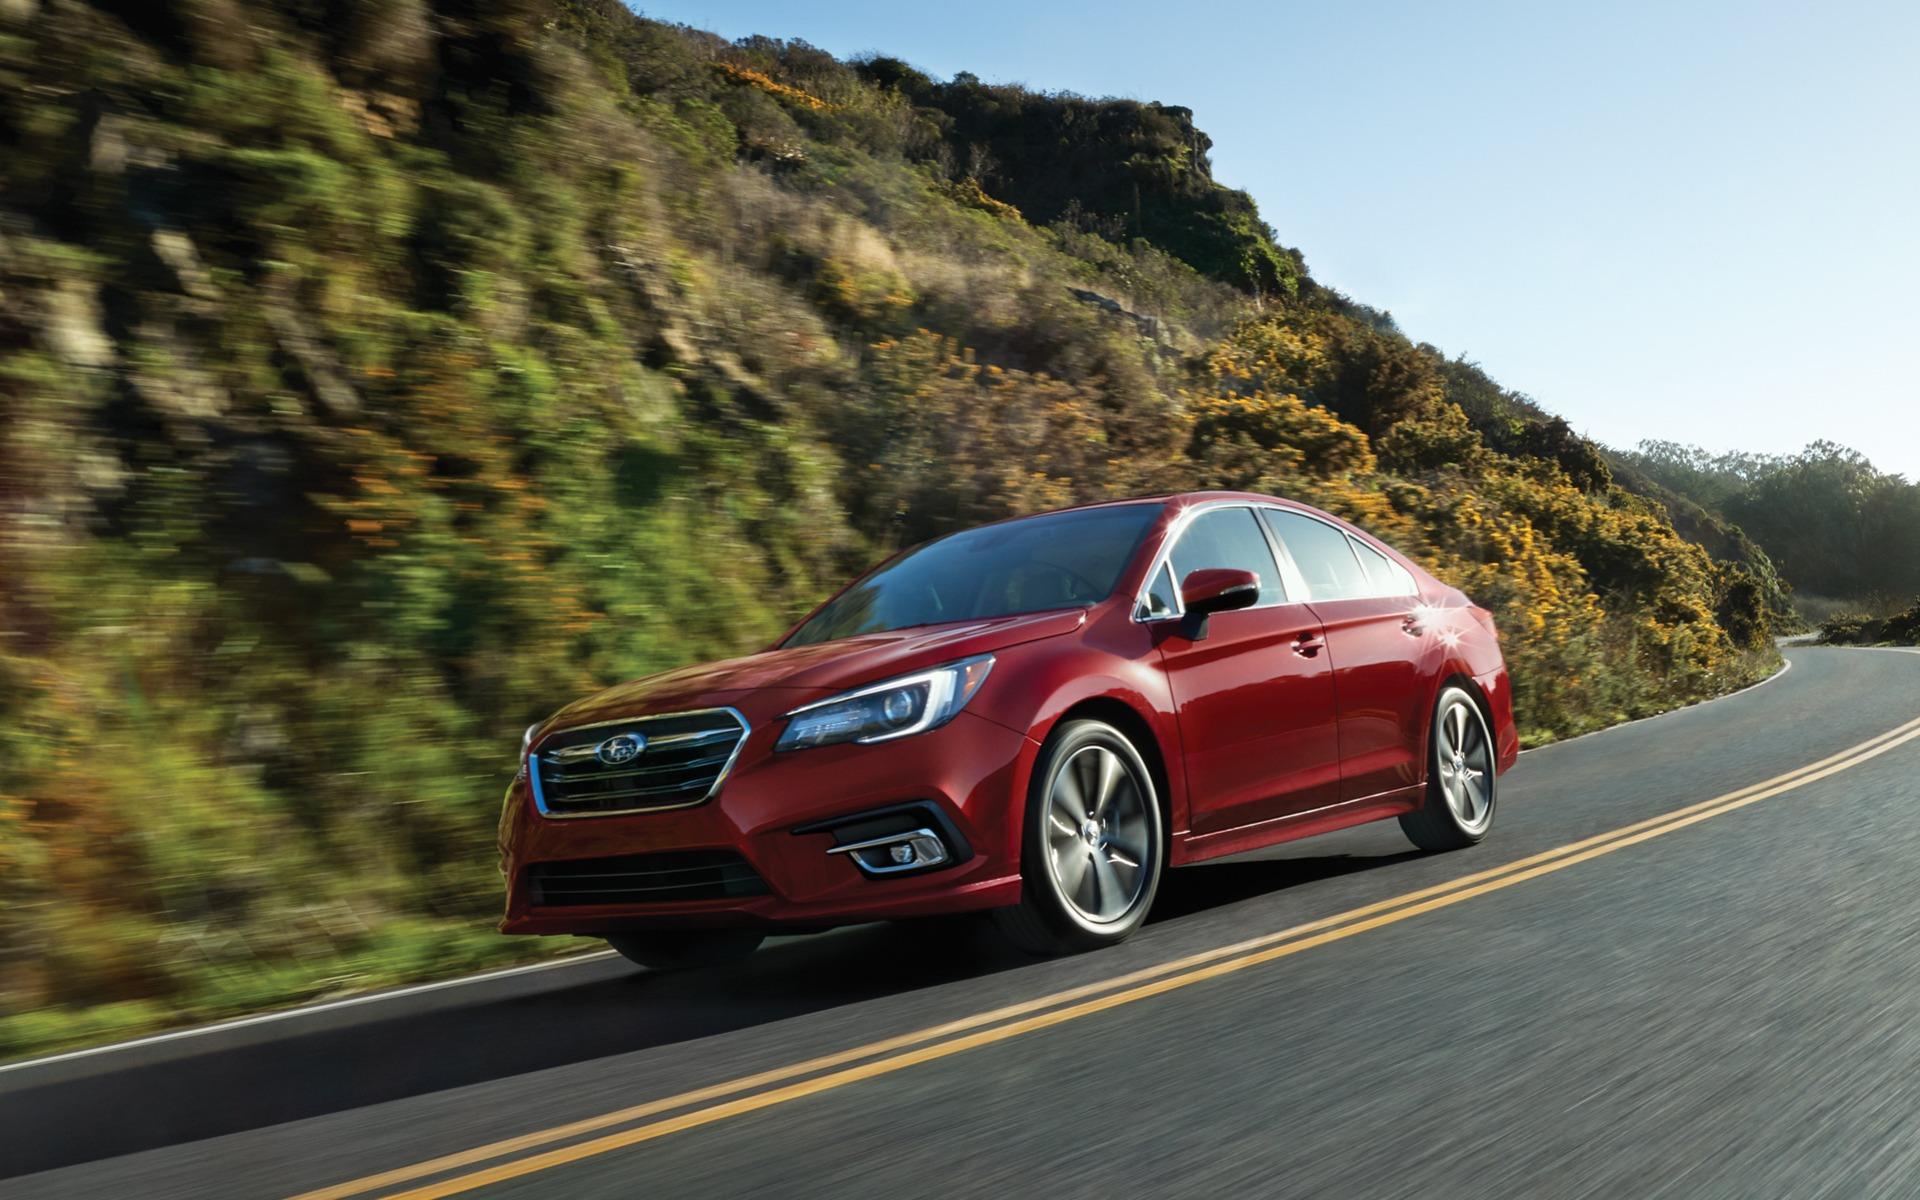 Subaru Legacy 2019 : cinq choses à savoir 361704_2019_Subaru_Legacy